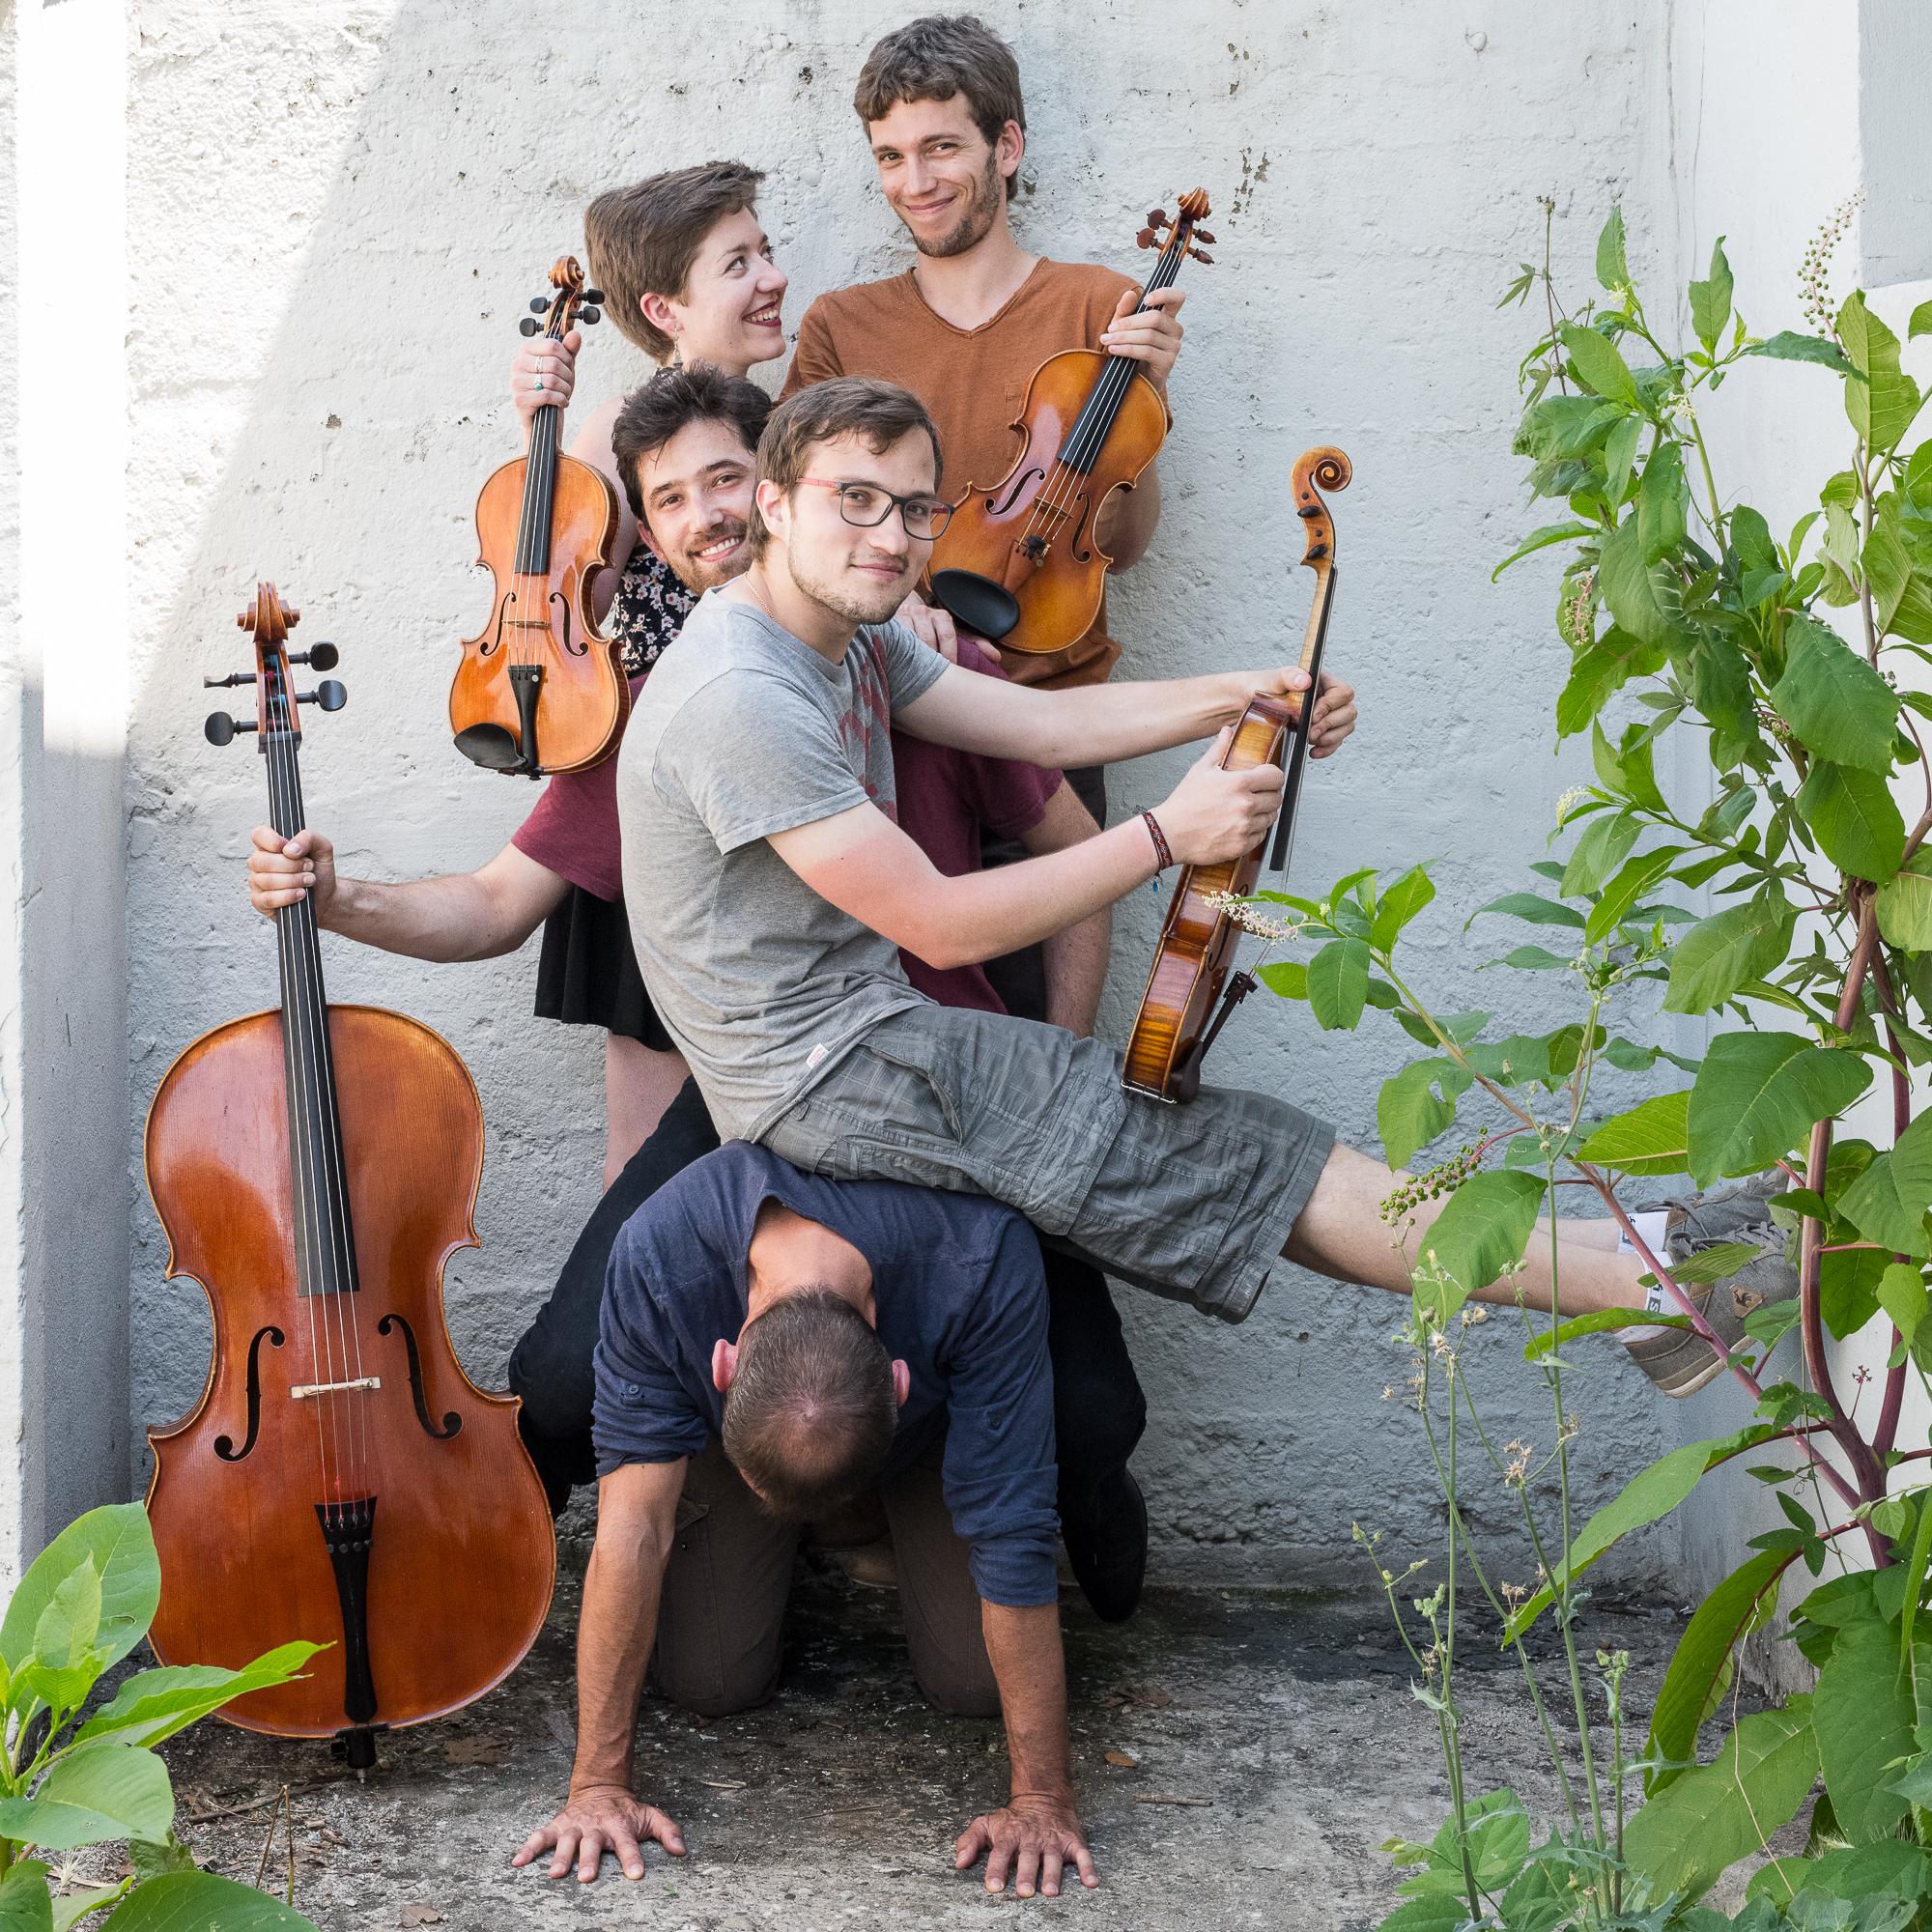 Musique - Le quatuor